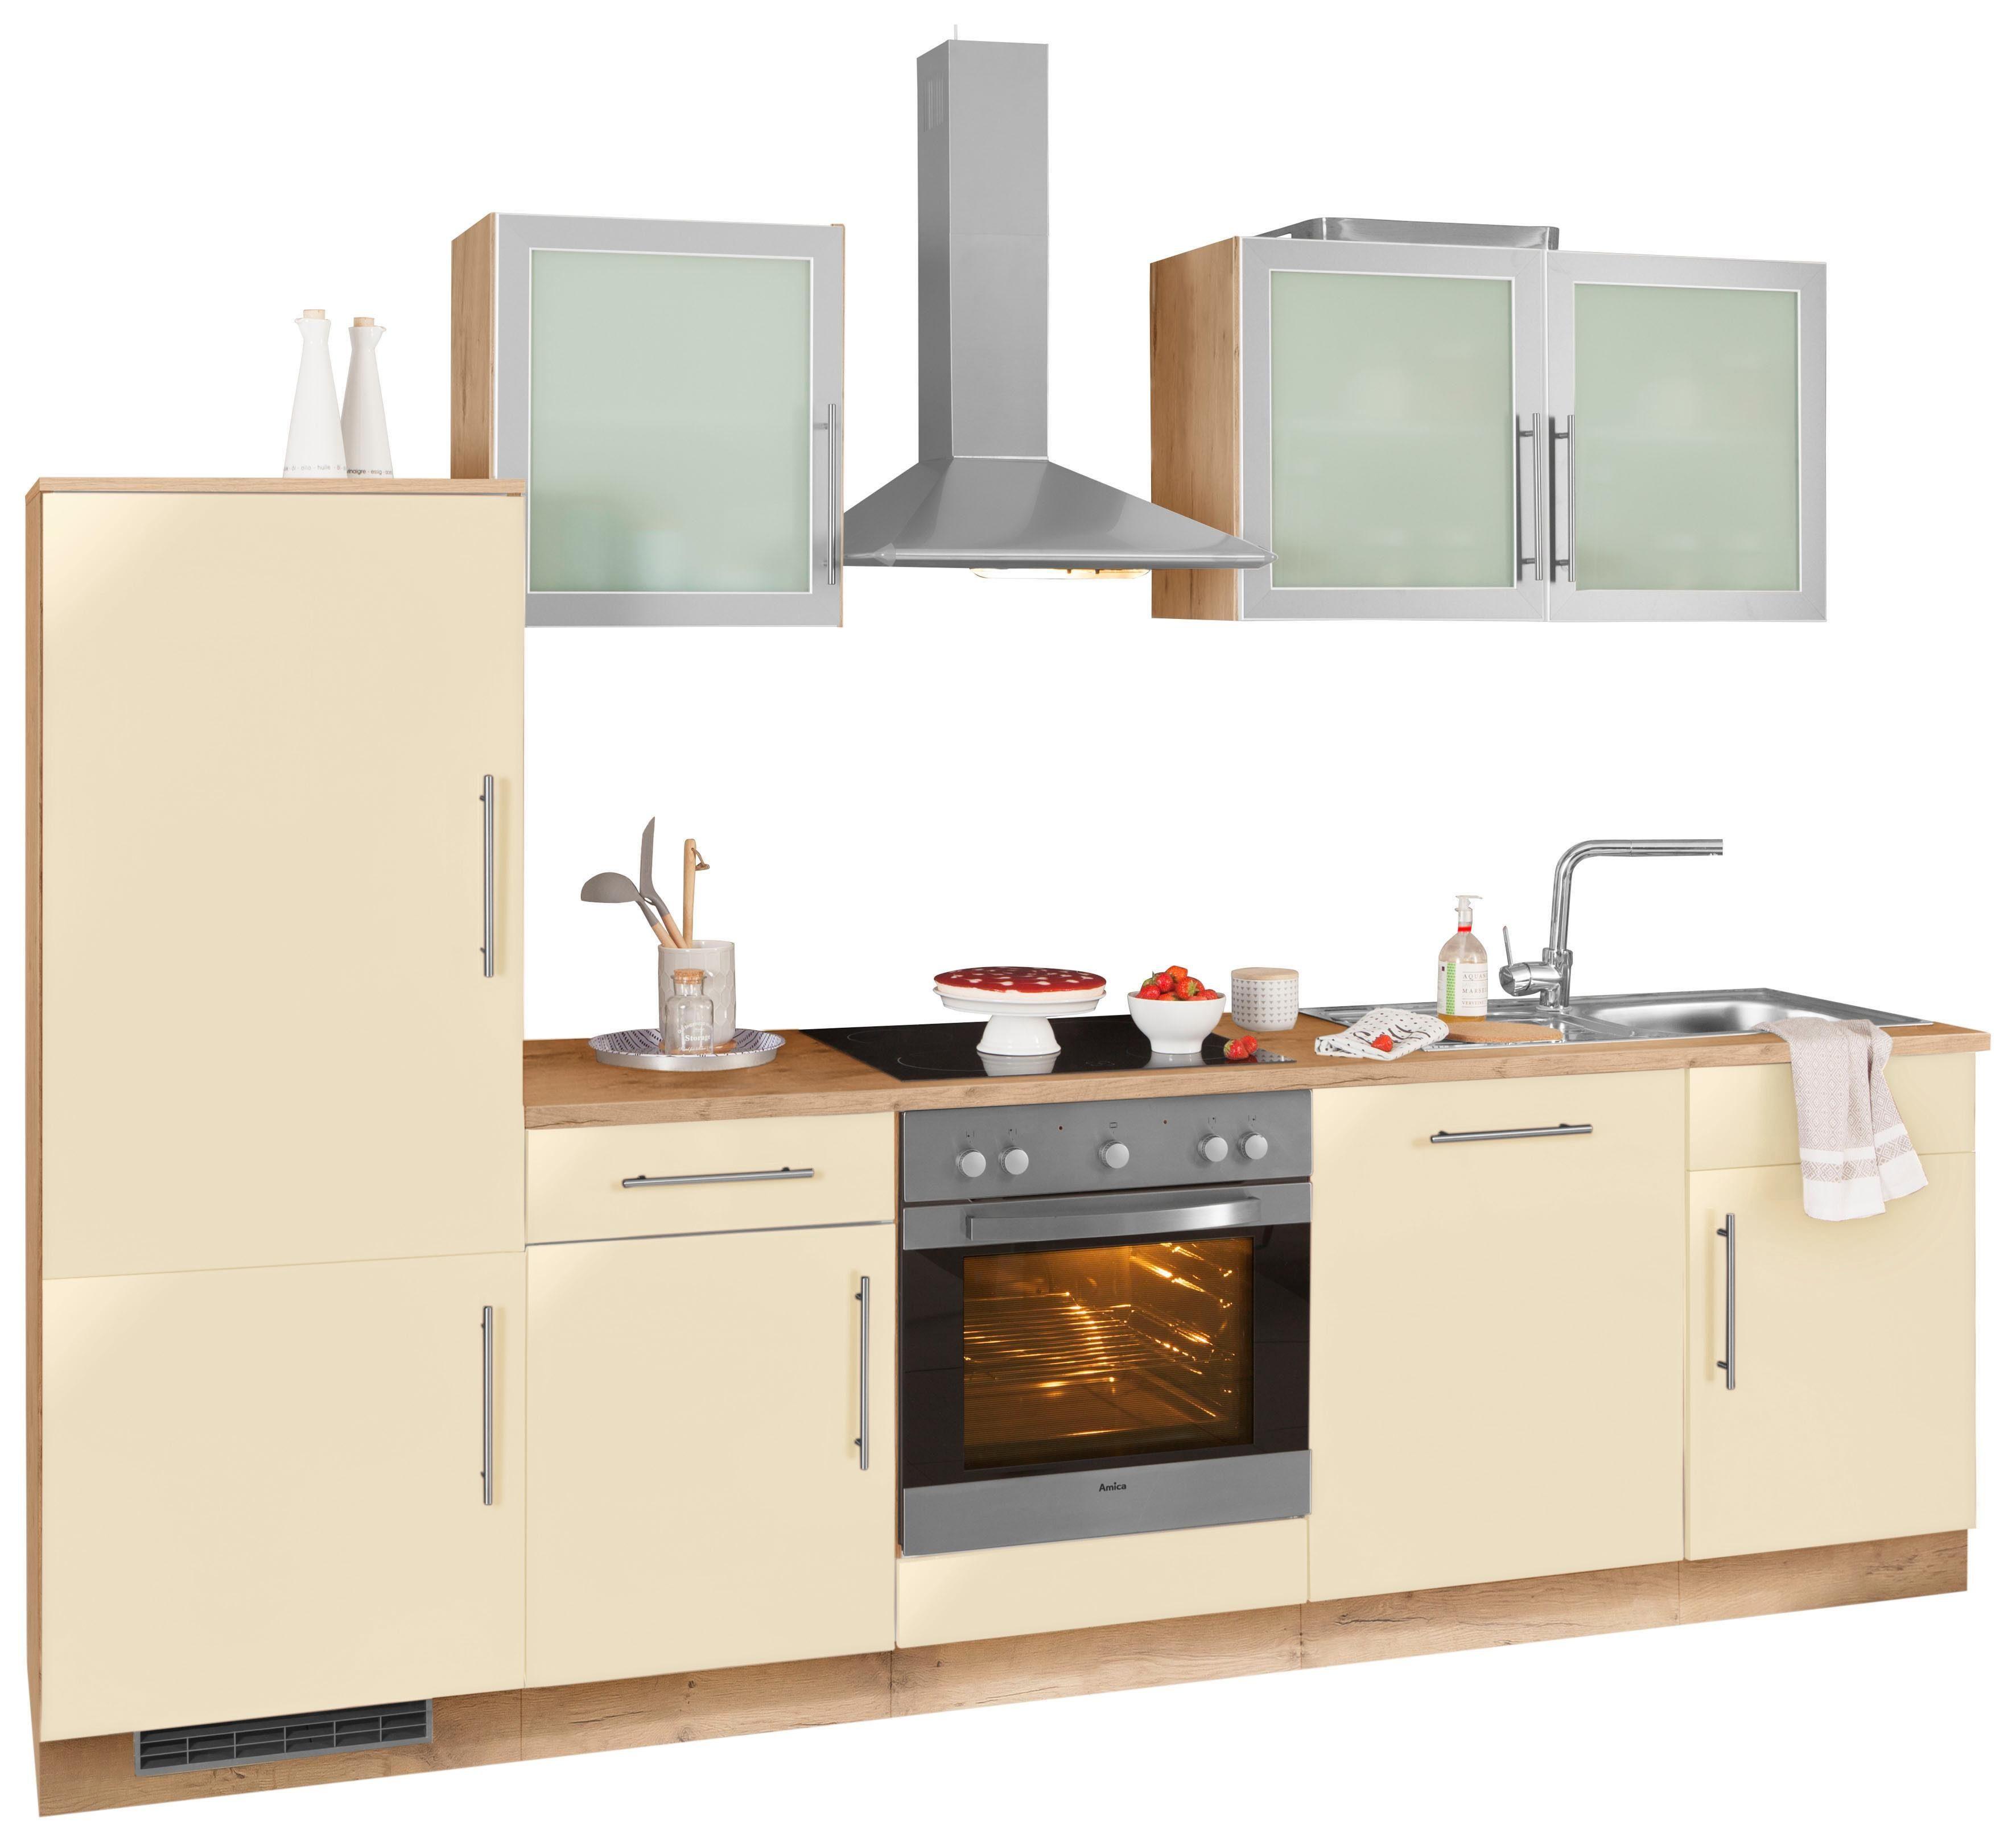 Küchen Ohne Geräte Otto  Sofa Outlet Nrw. Sofa Outlet Nrw